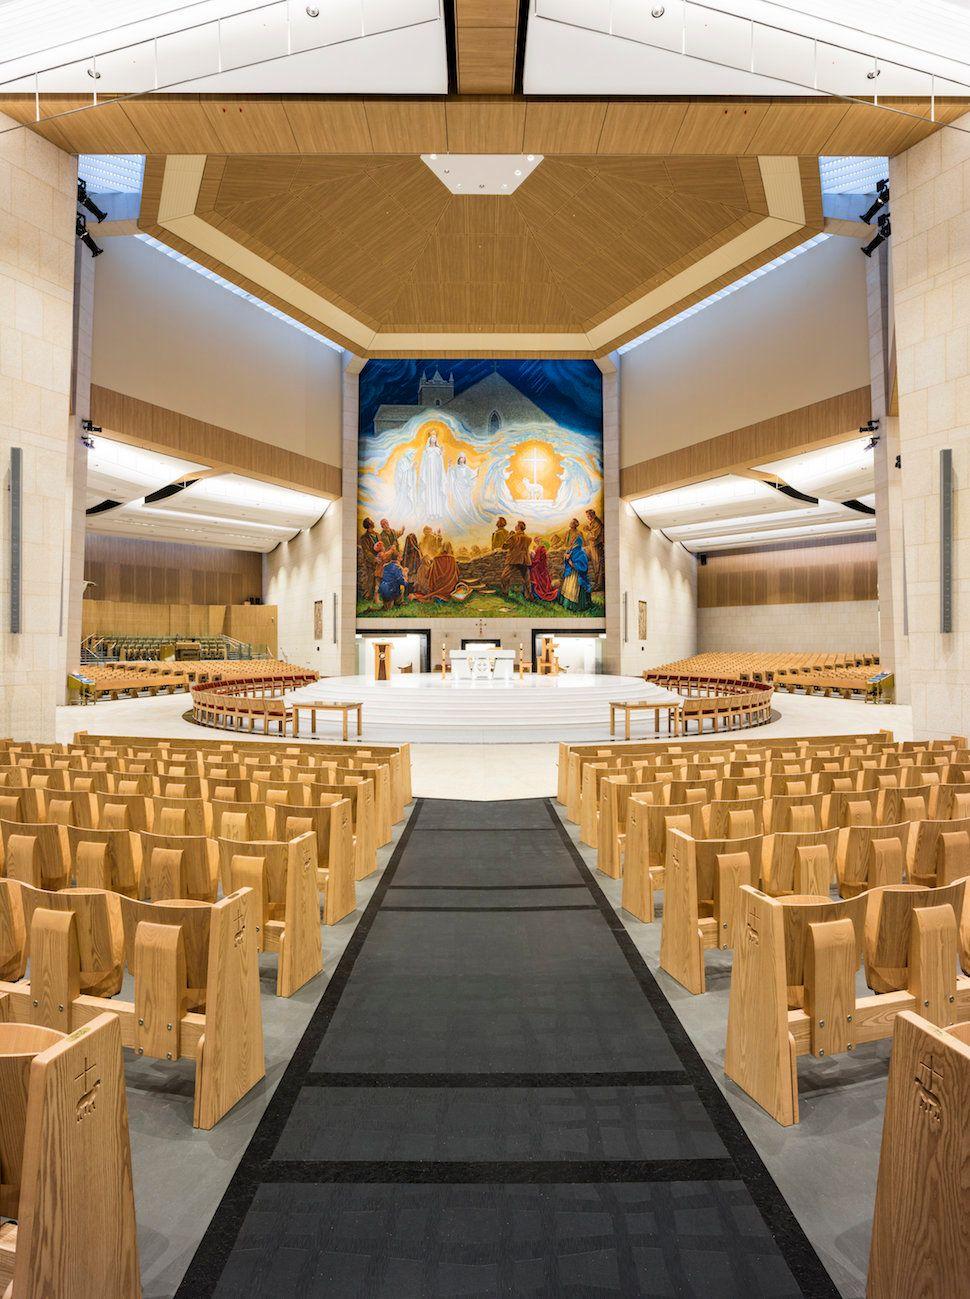 Wejchert Architects; Knock Basilica Interior Design; Knock, County Mayo, Ireland; Liturgical/Interior Design